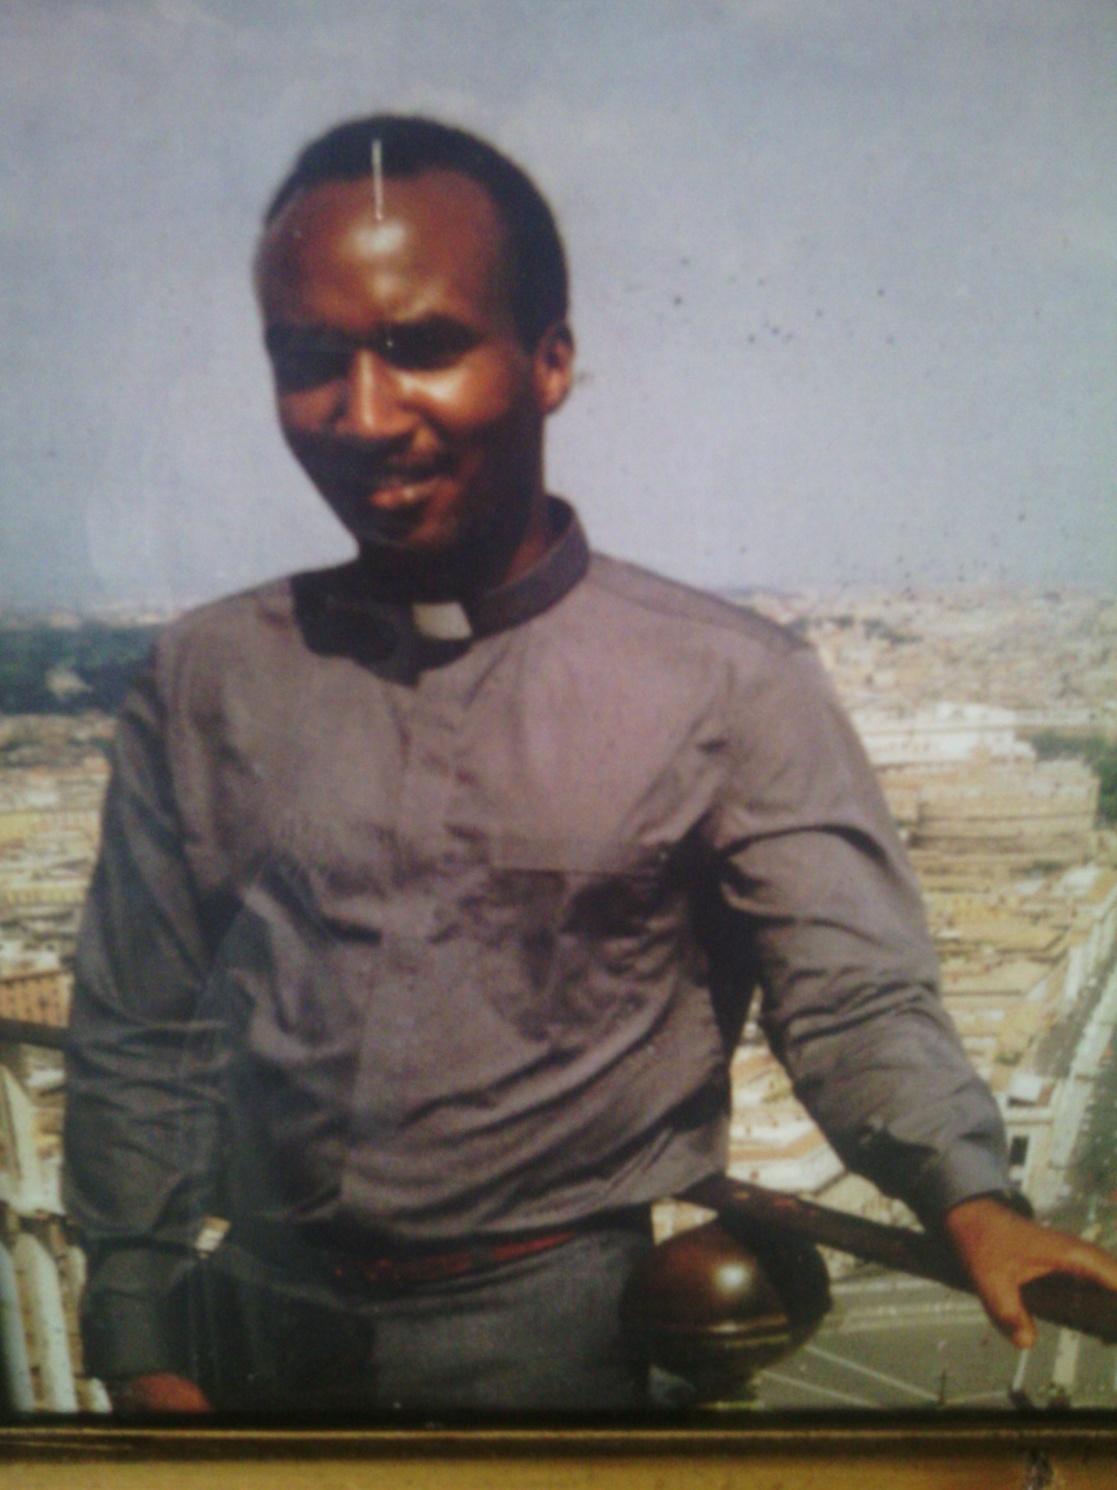 C:\Documents and Settings\user\Desktop\INDIRIMBO\ISIMBI 51\UDAHEMUKA\Fondation Mgr RWABILINDA\PHOTO\Picture and video 084.jpg